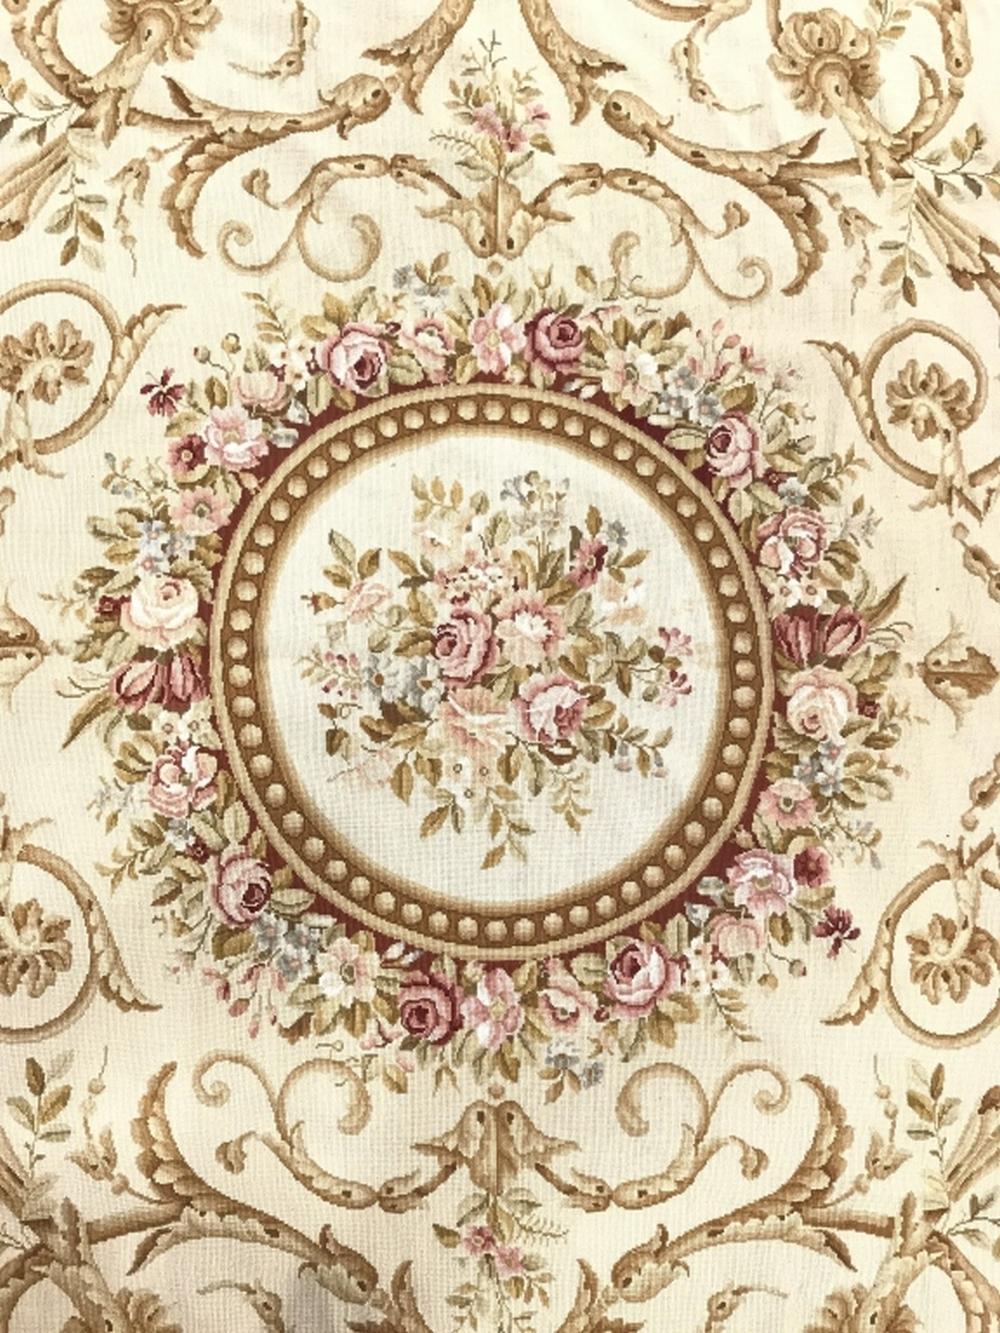 Handmade Floral Detailed Needlepoint Rug